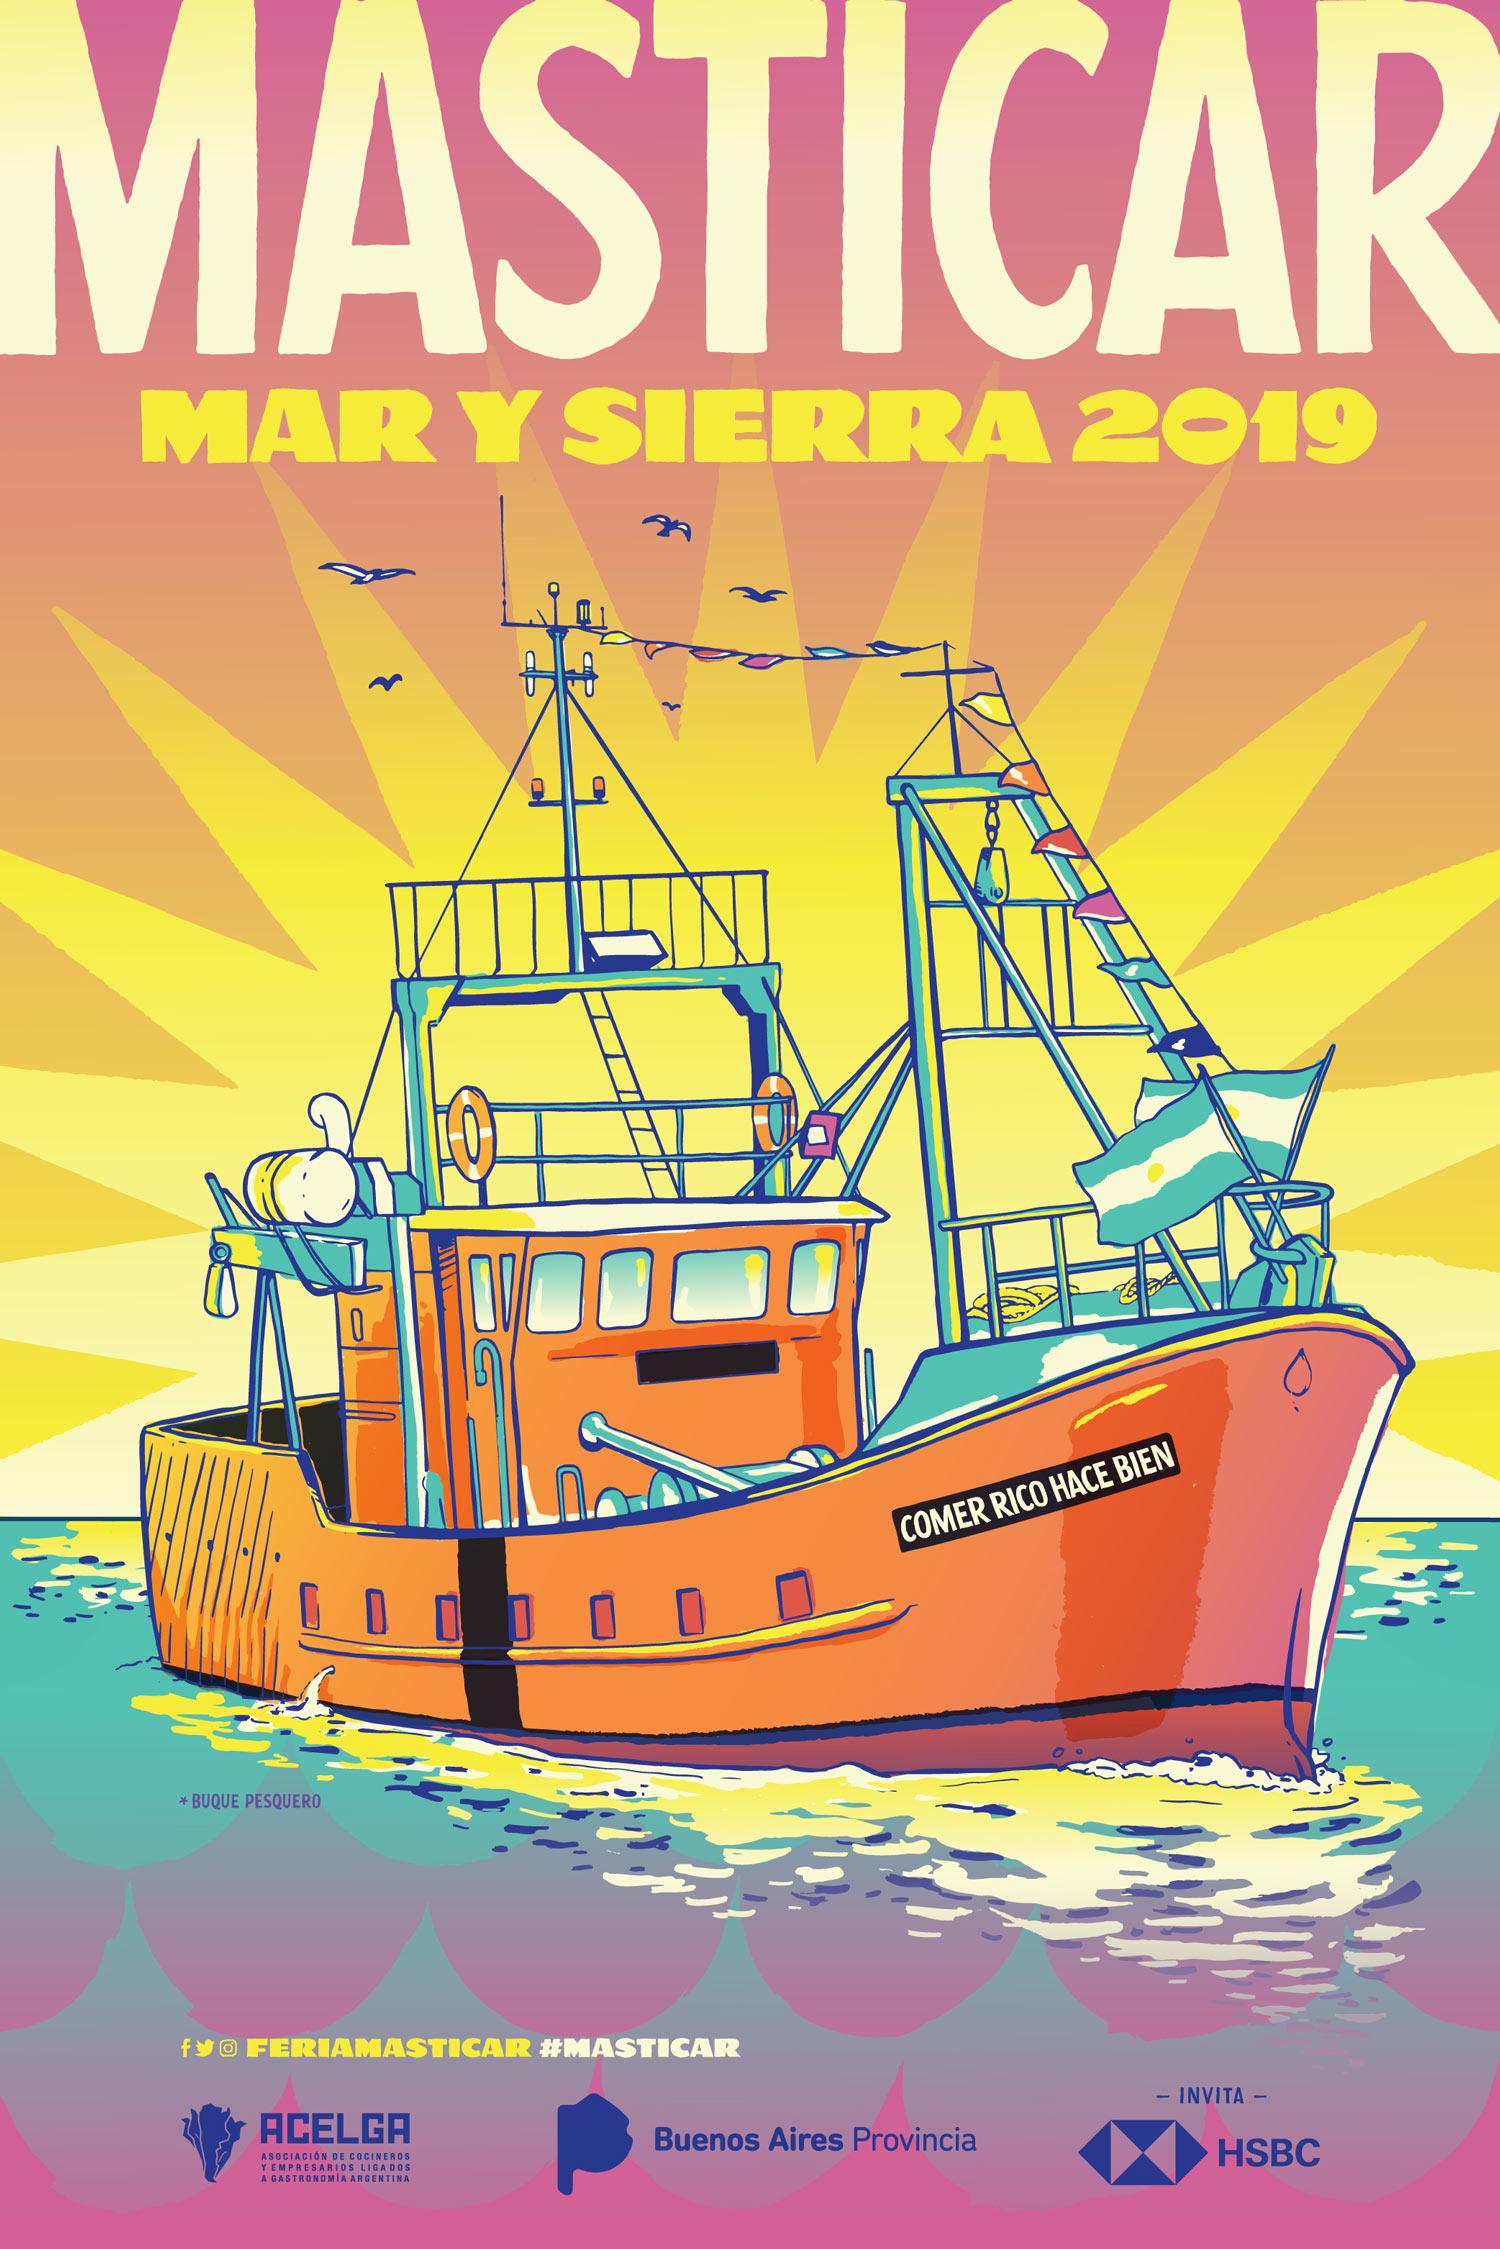 MASTICAR-Mar-y-Sierra-2019_Yanina-Arabena_Guillermo-Vizzari_01.jpg